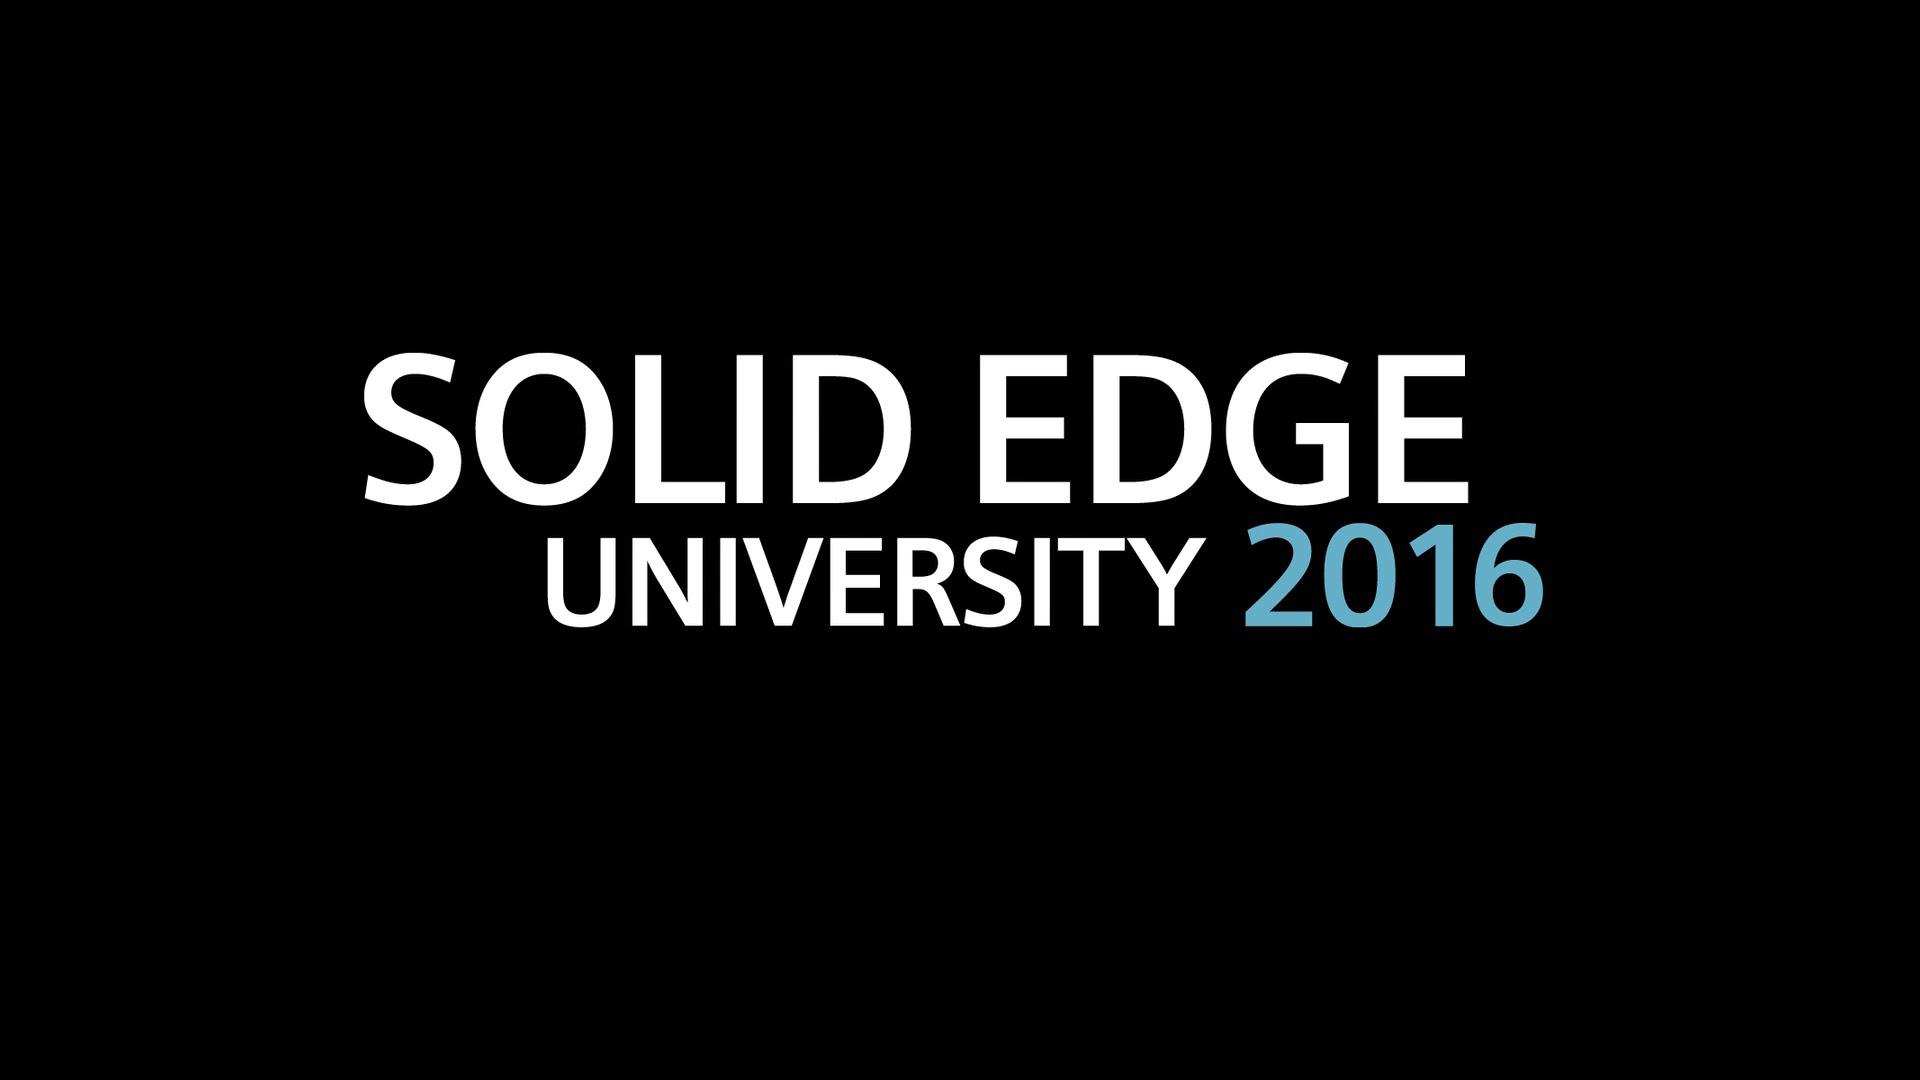 Solid Edge university.jpg